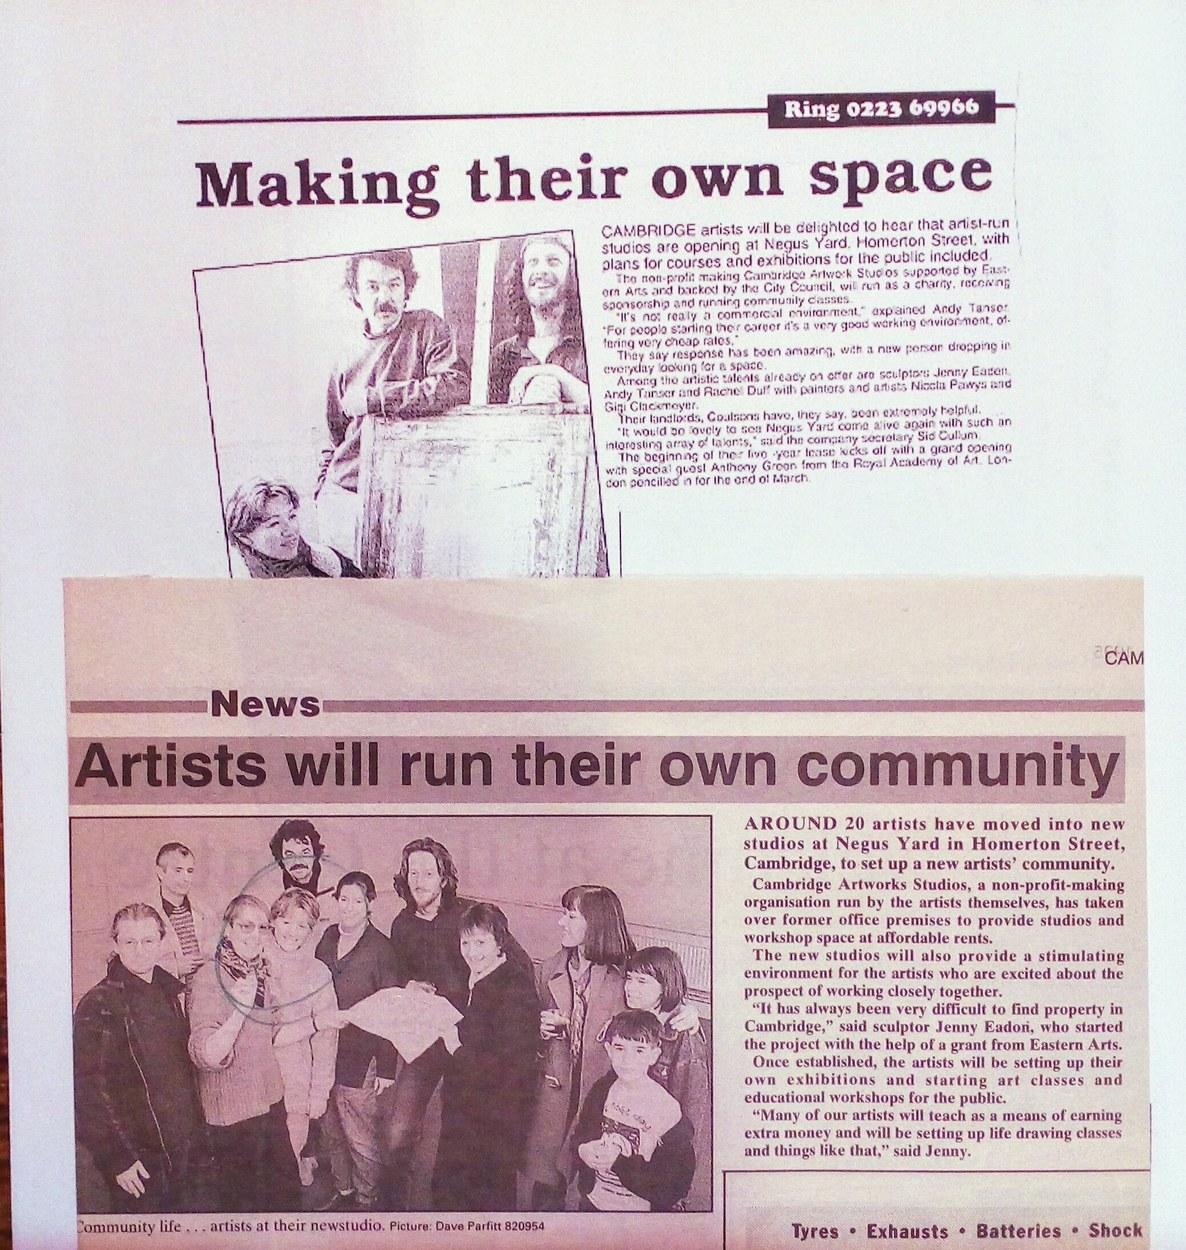 Founding artist run studios